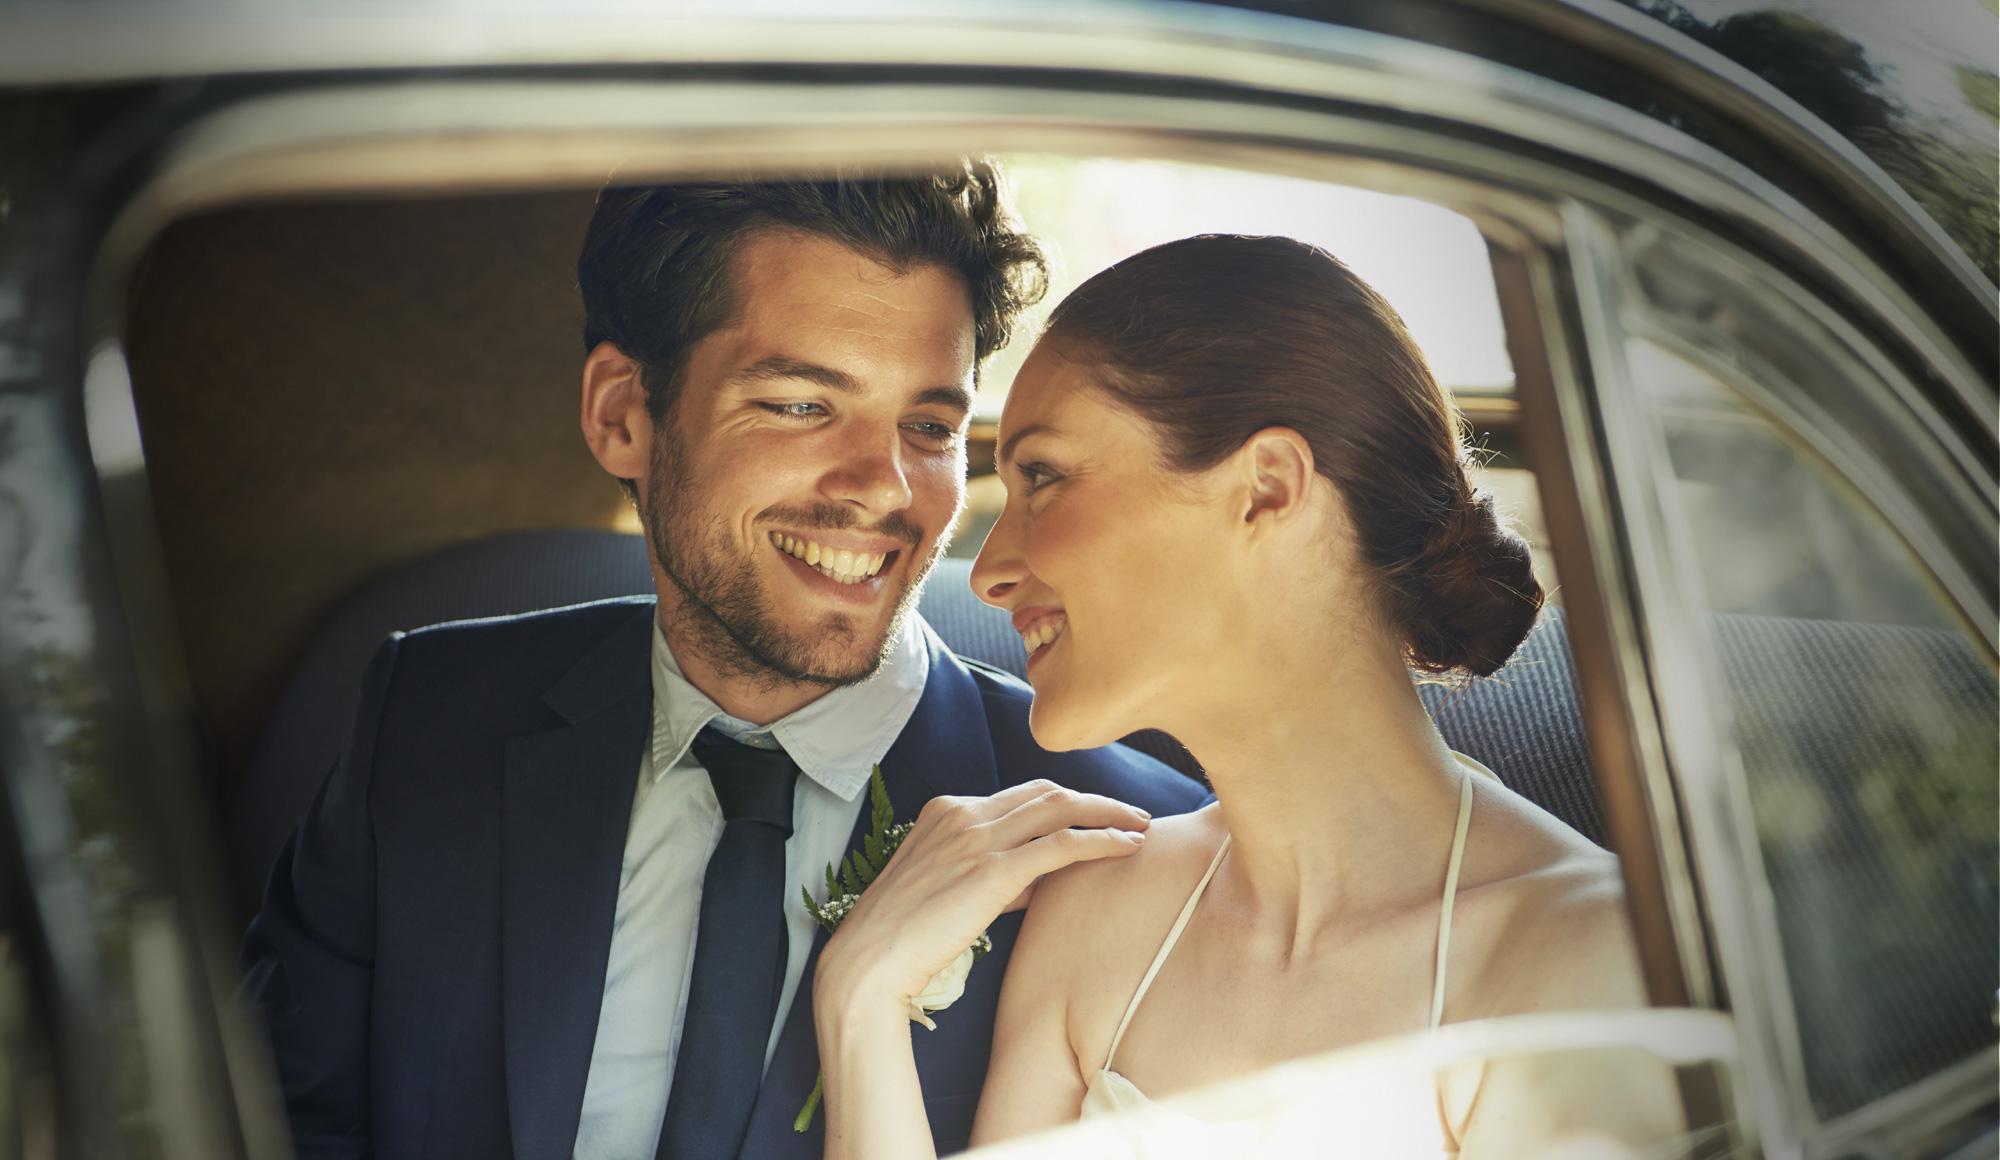 Wedding Chauffeur Services